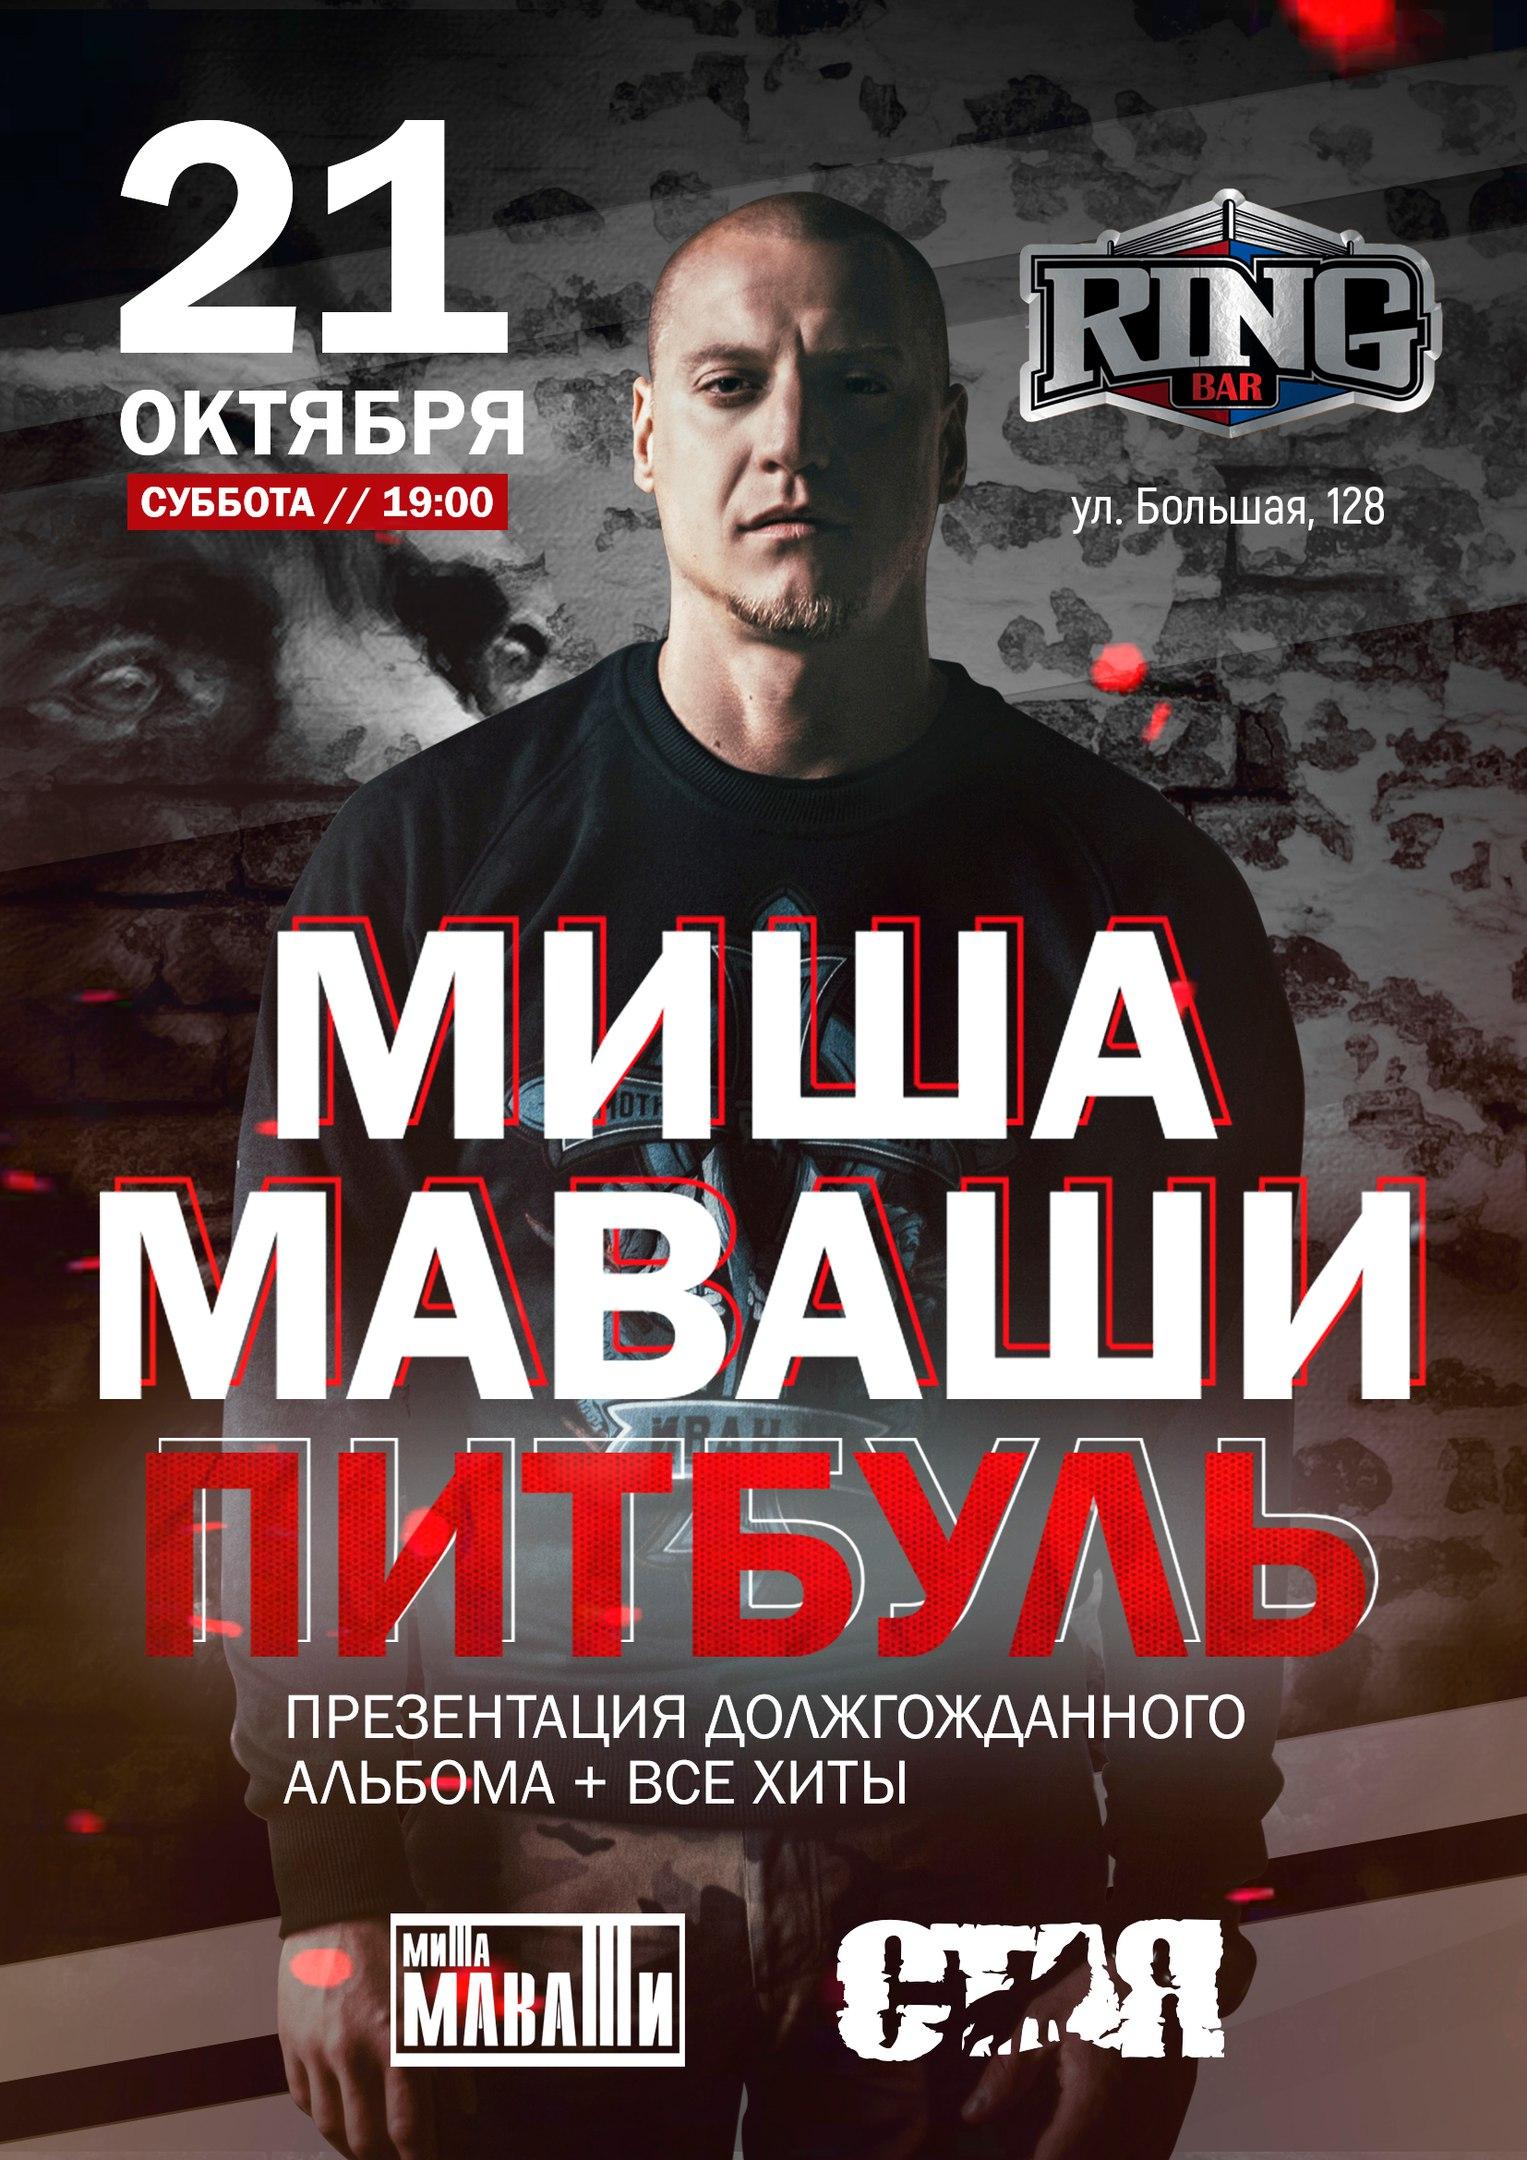 Афиша ринг бар хабаровск